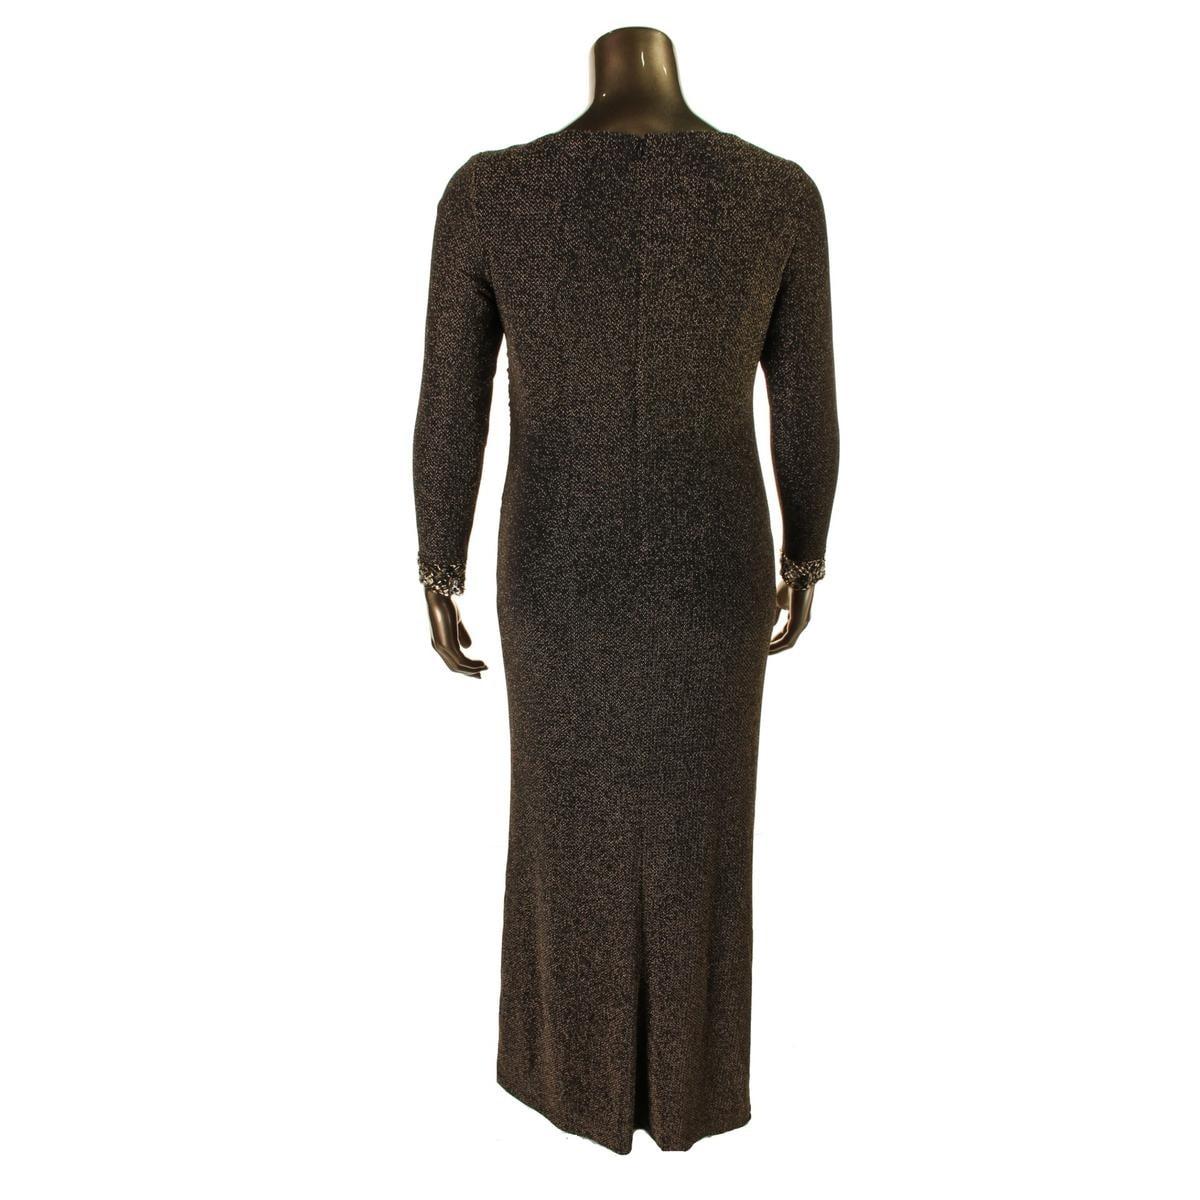 Patra Womens Evening Dress Metallic Prom Free Shipping On Orders